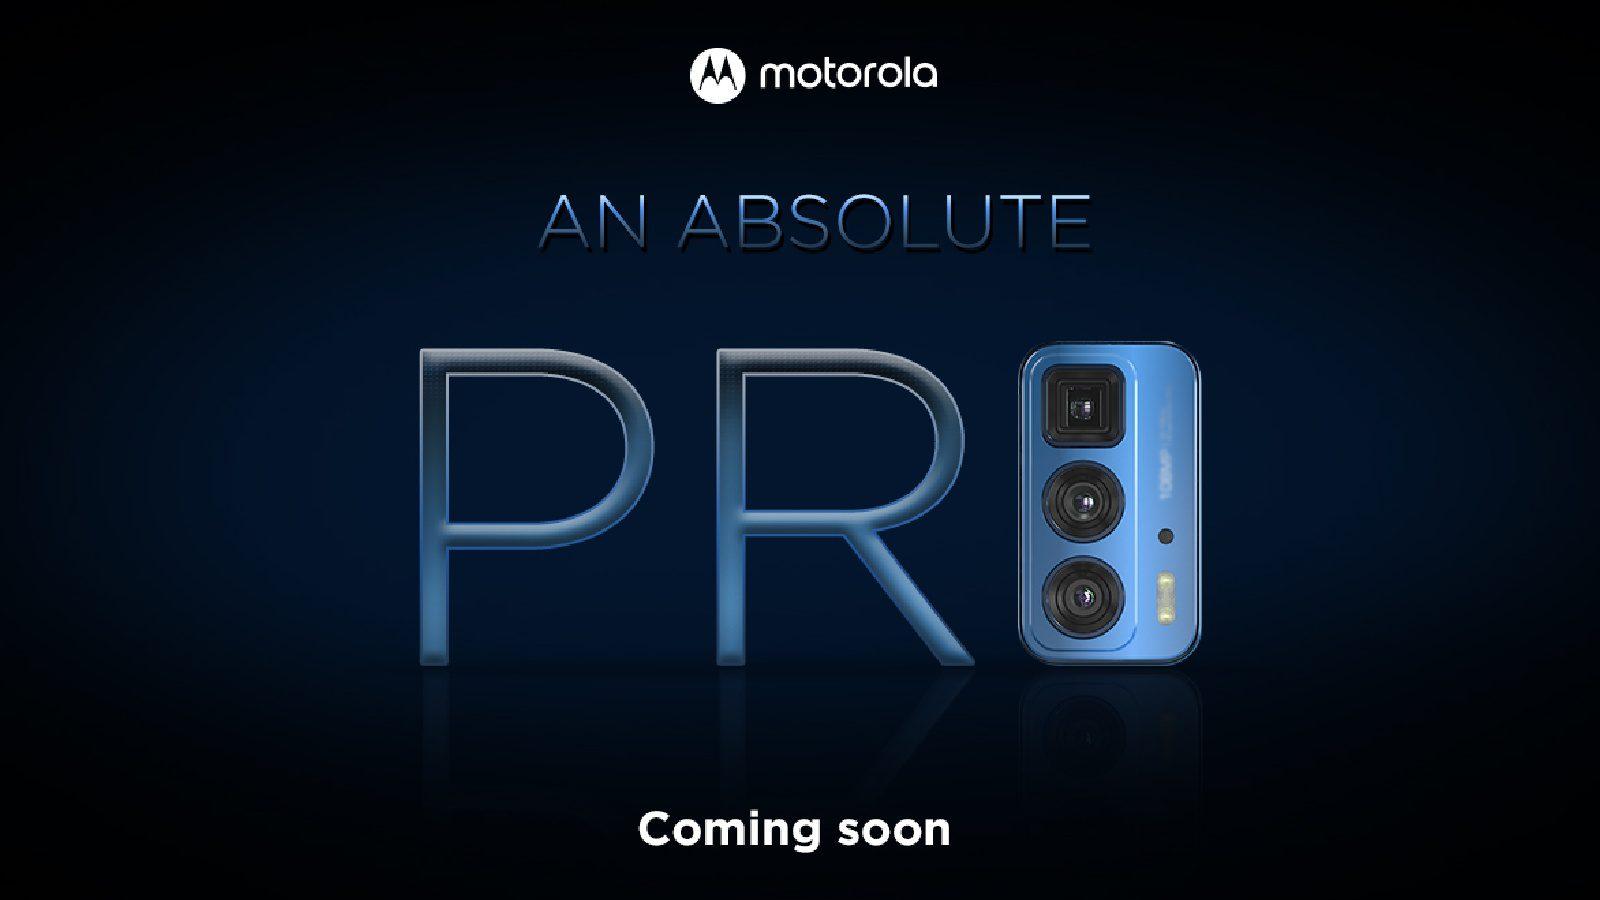 Motorola New Products